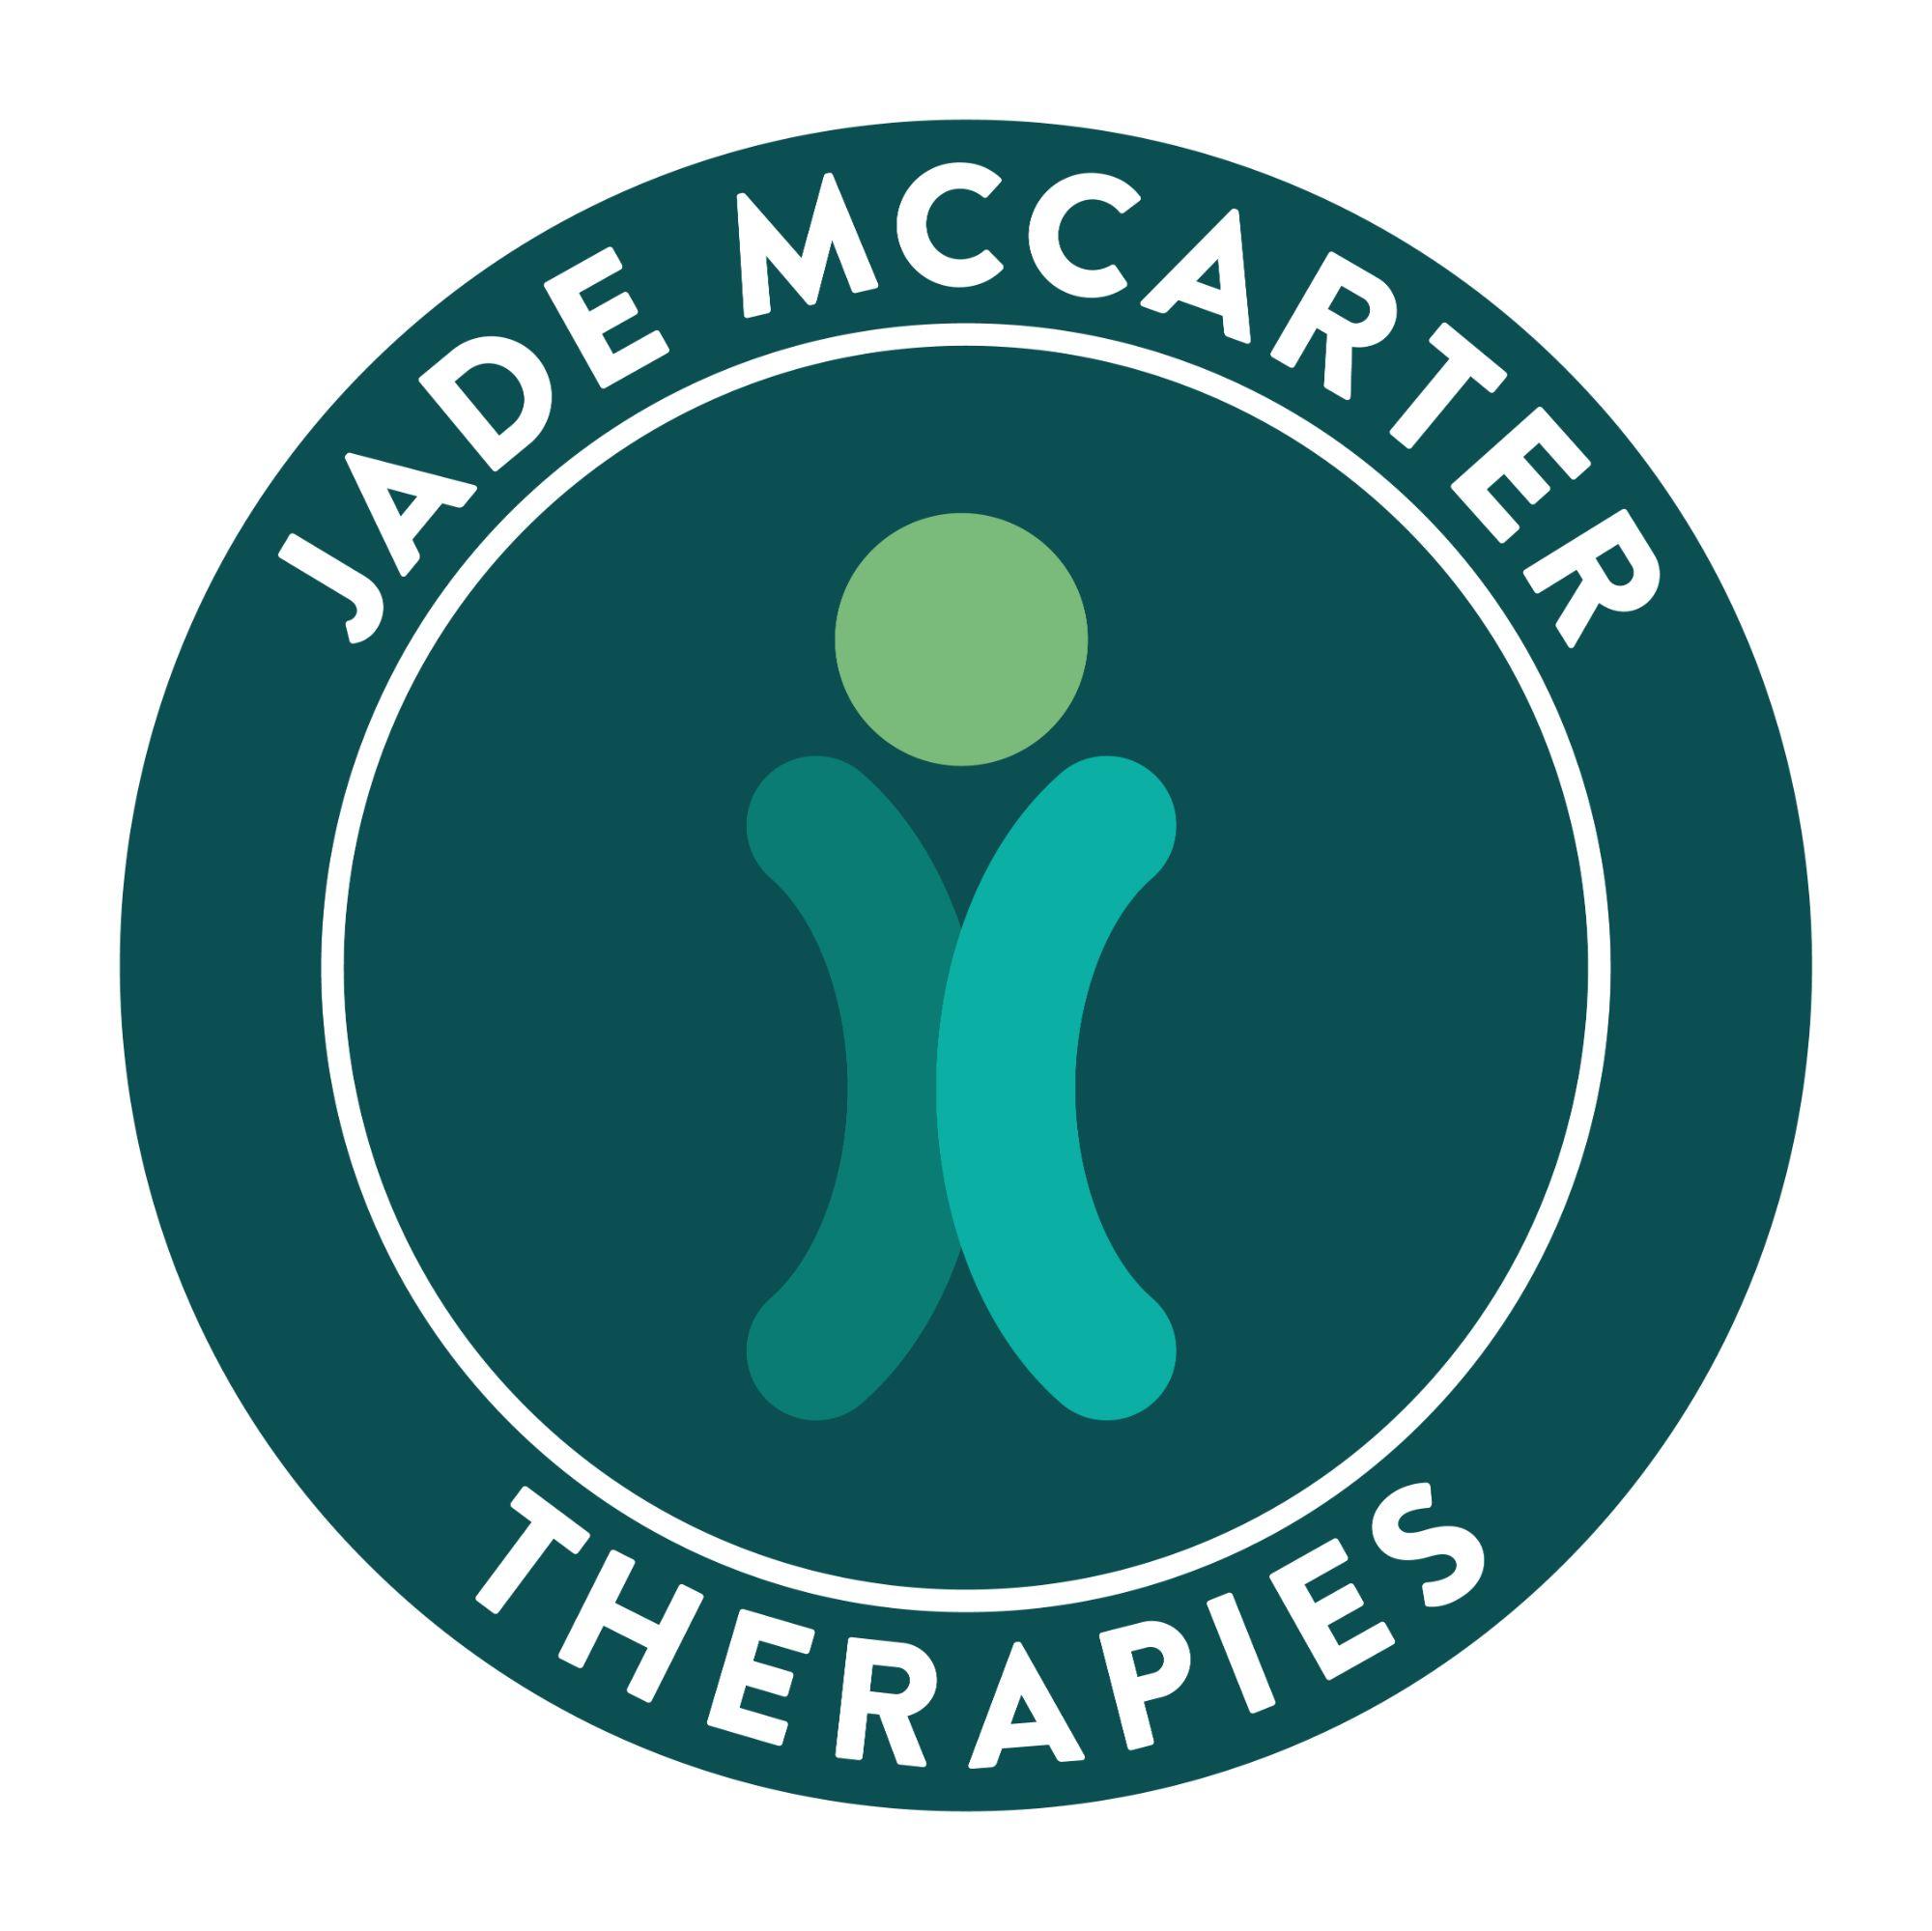 JadeMcTherapies-FullLogo-Dark.jpg